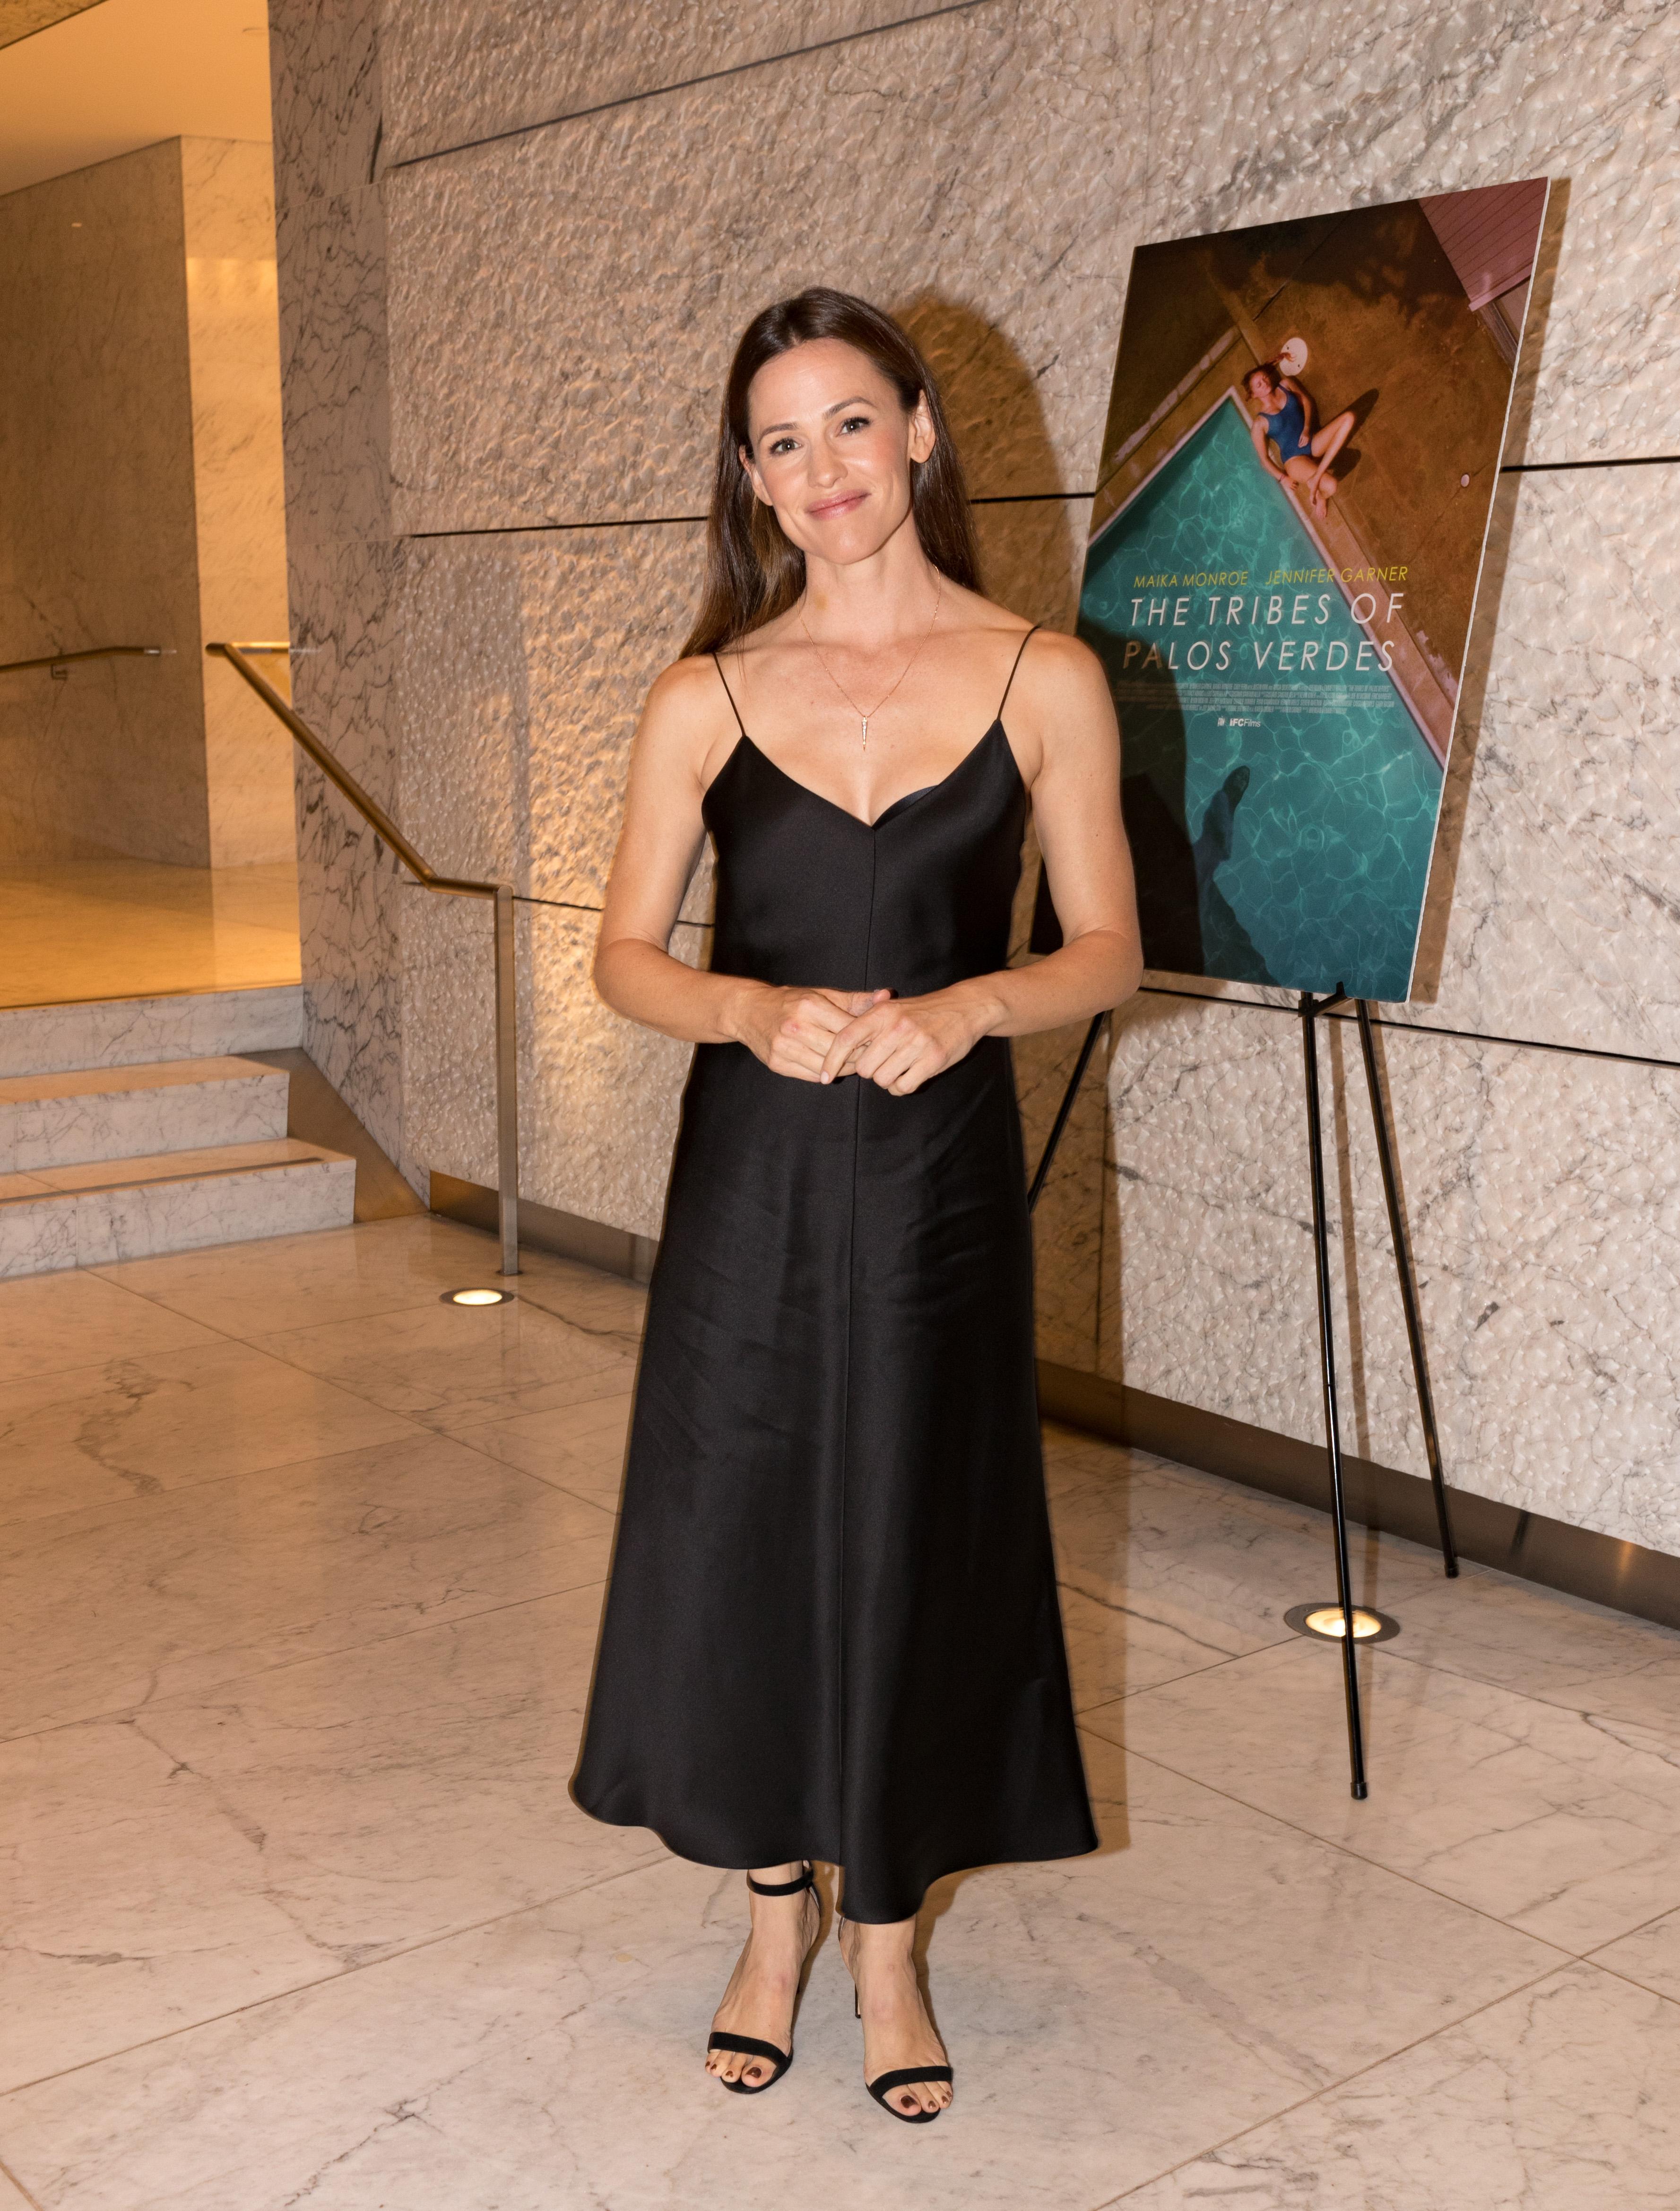 Jennifer Garner Attends 'The Palos Verdes Tribe' Premiere